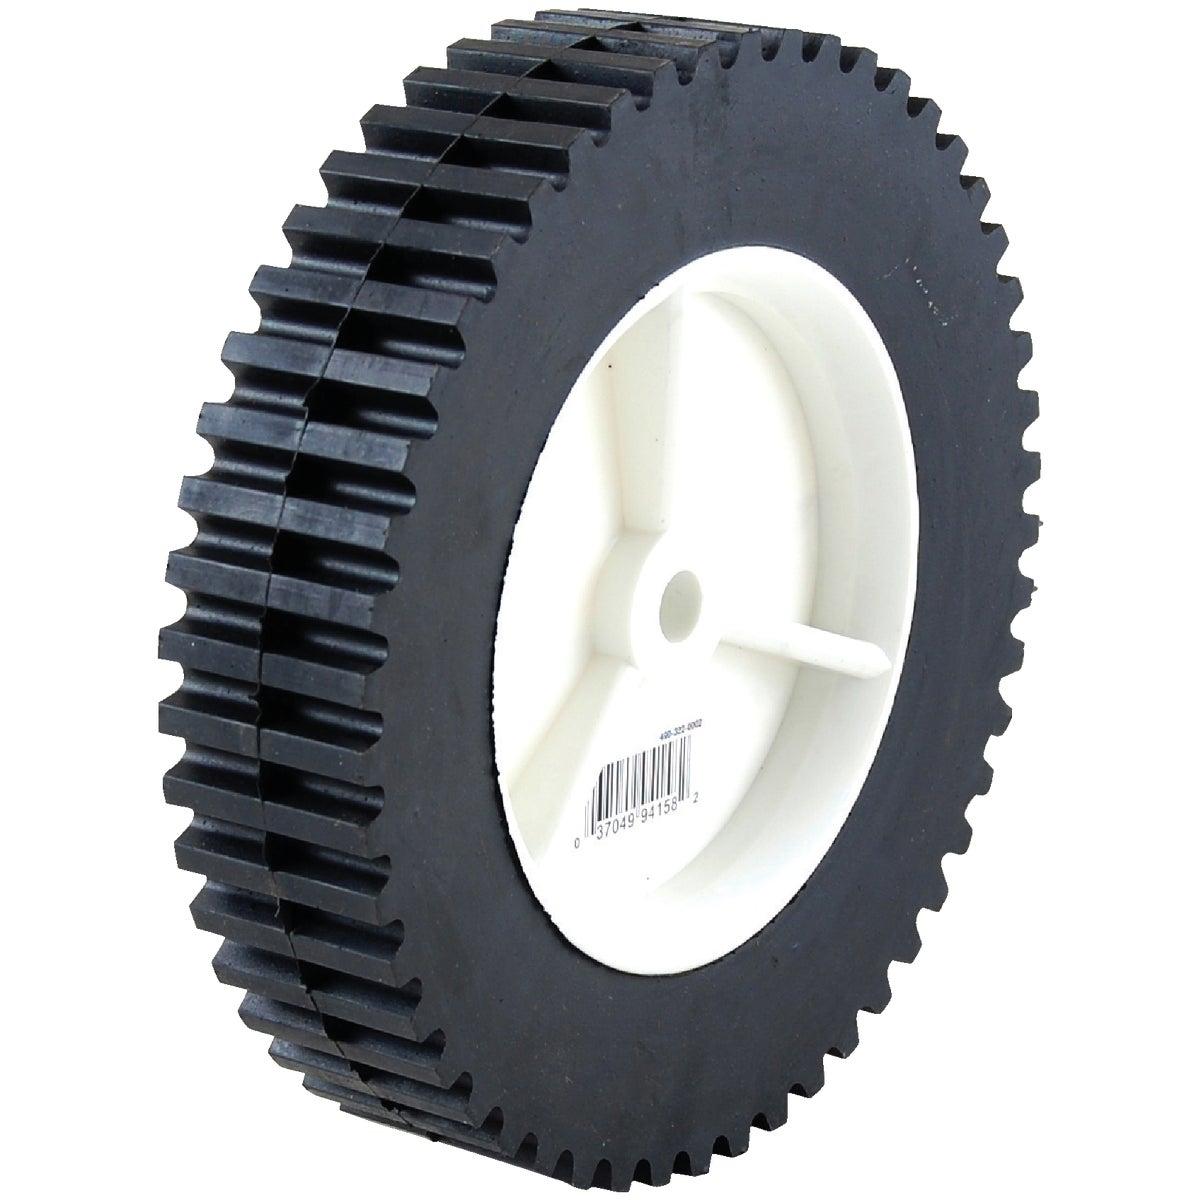 Lightweight Offset Hub Wheel, 490-323-0002